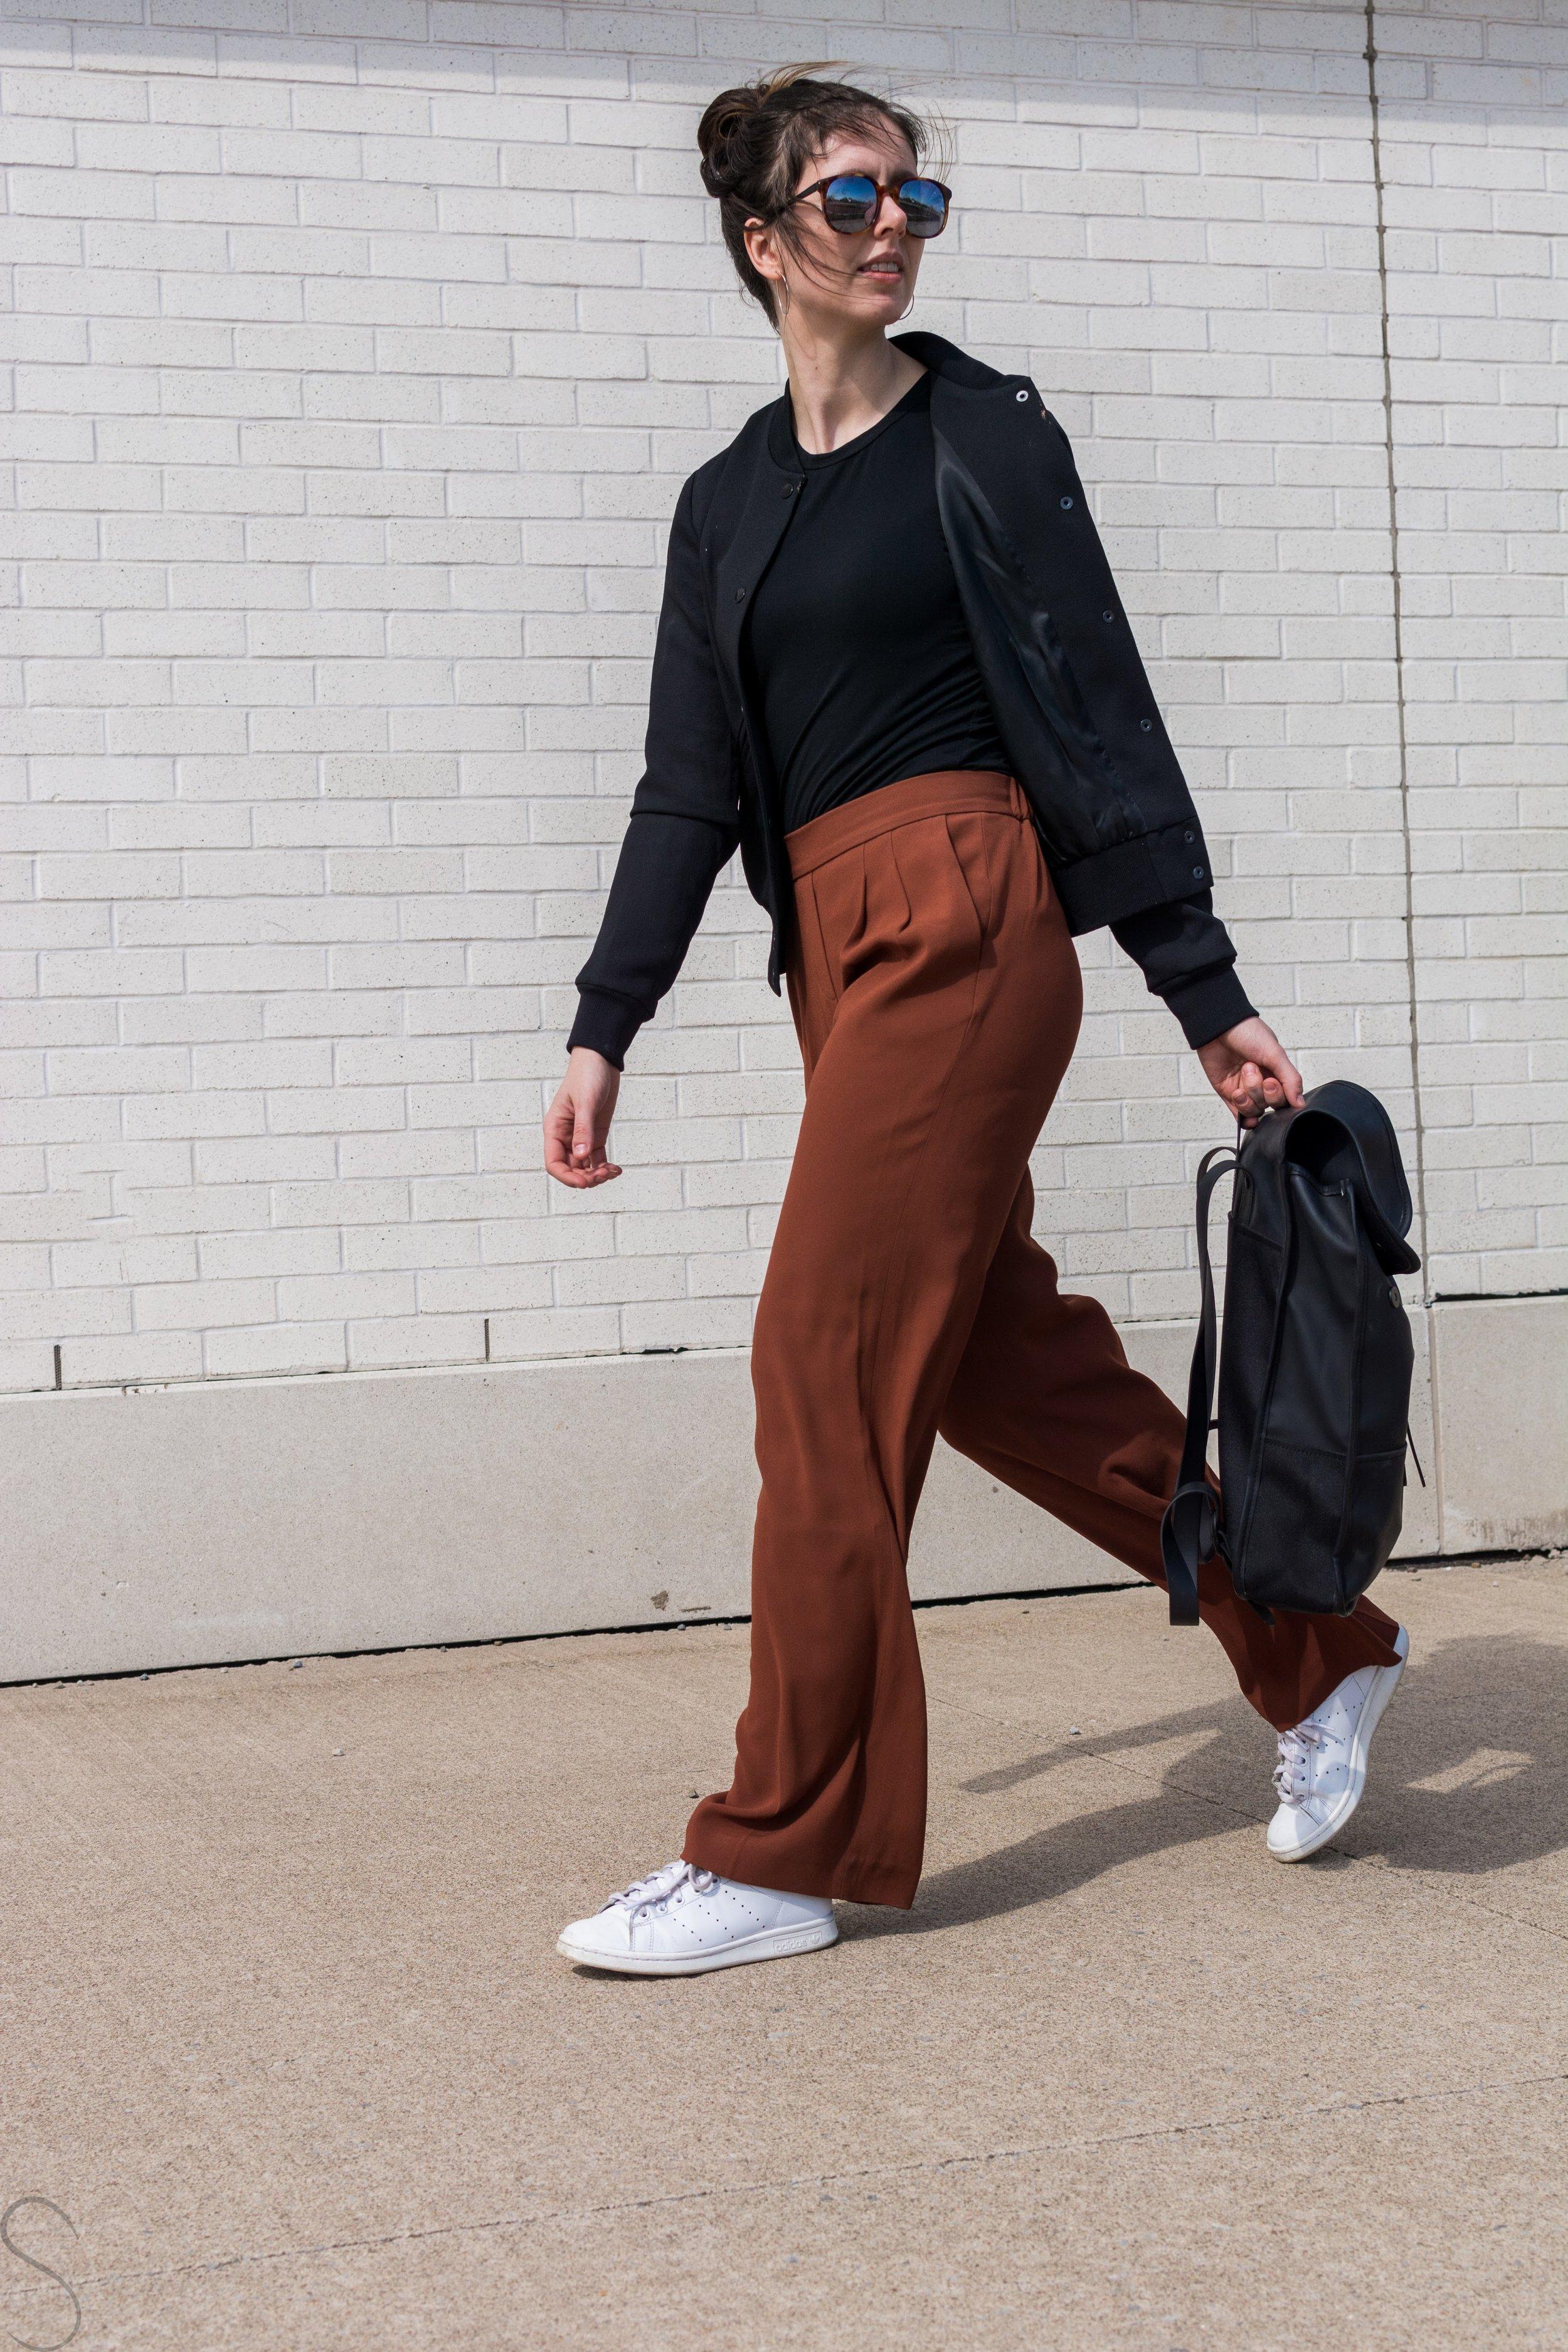 rust wide legged pants artizia rains commuter bag Wilfred poussin jacket Adidas Stan smiths